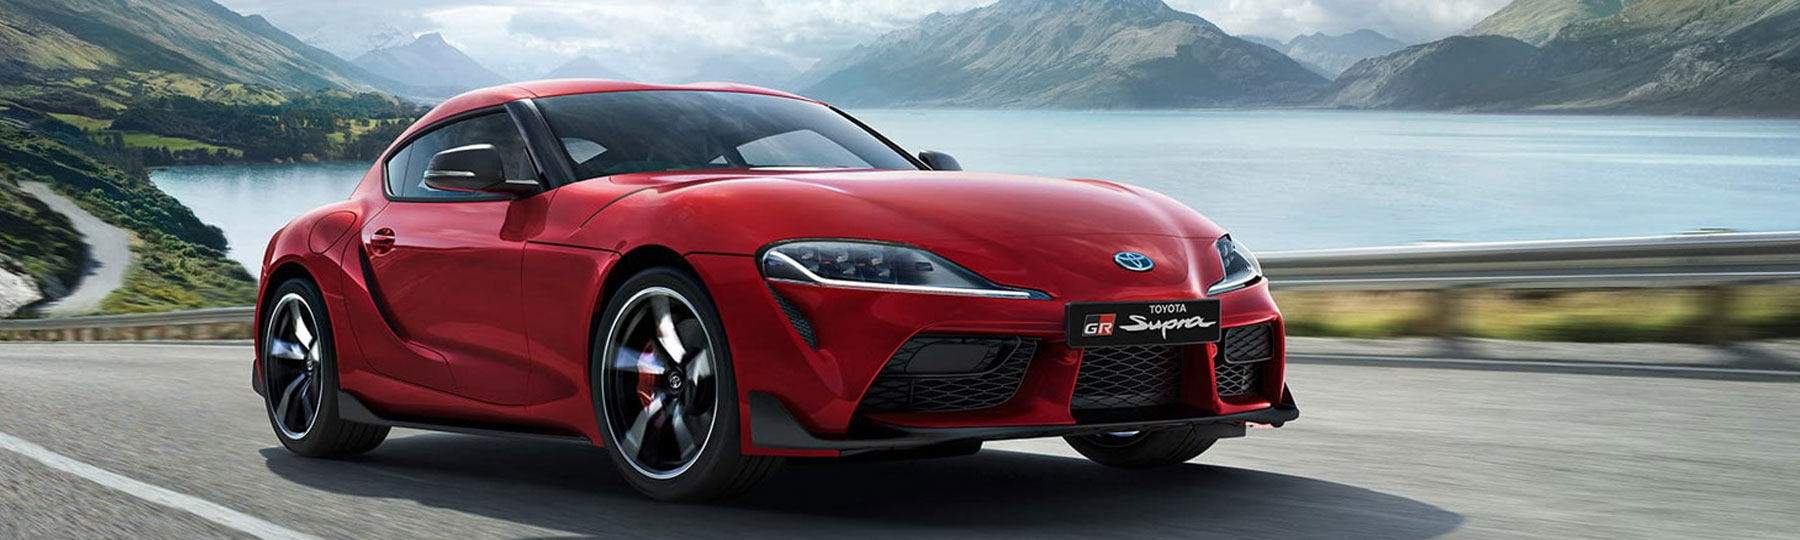 Toyota GR Supra New Car Offer